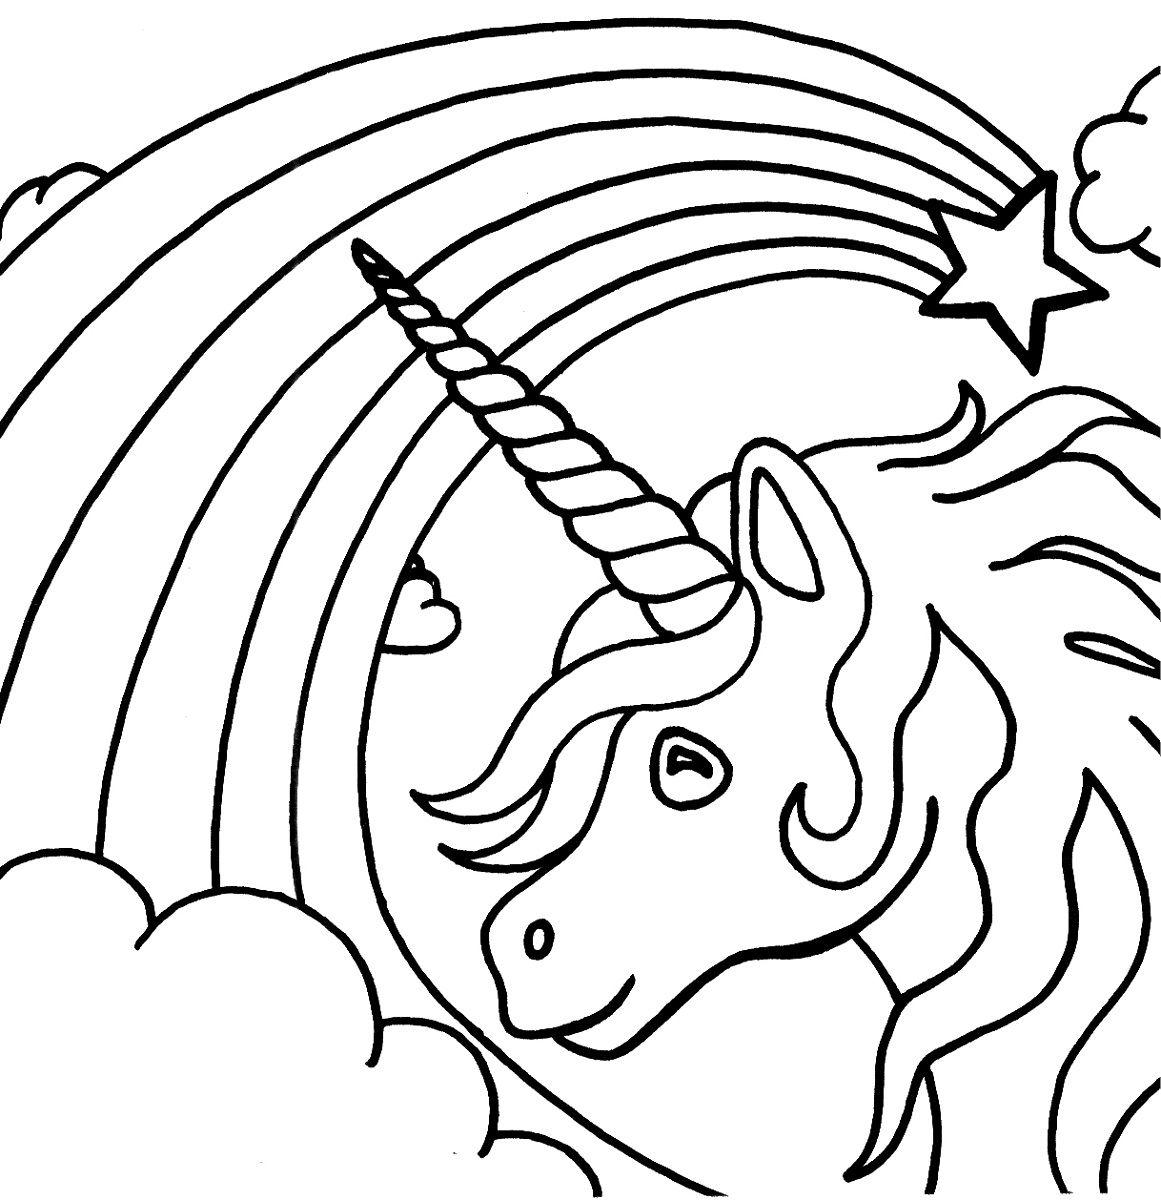 Coloring Pages Unicorns Popular Unicorn Sheet Rainbow Page ... | free printable coloring pages unicorn rainbow